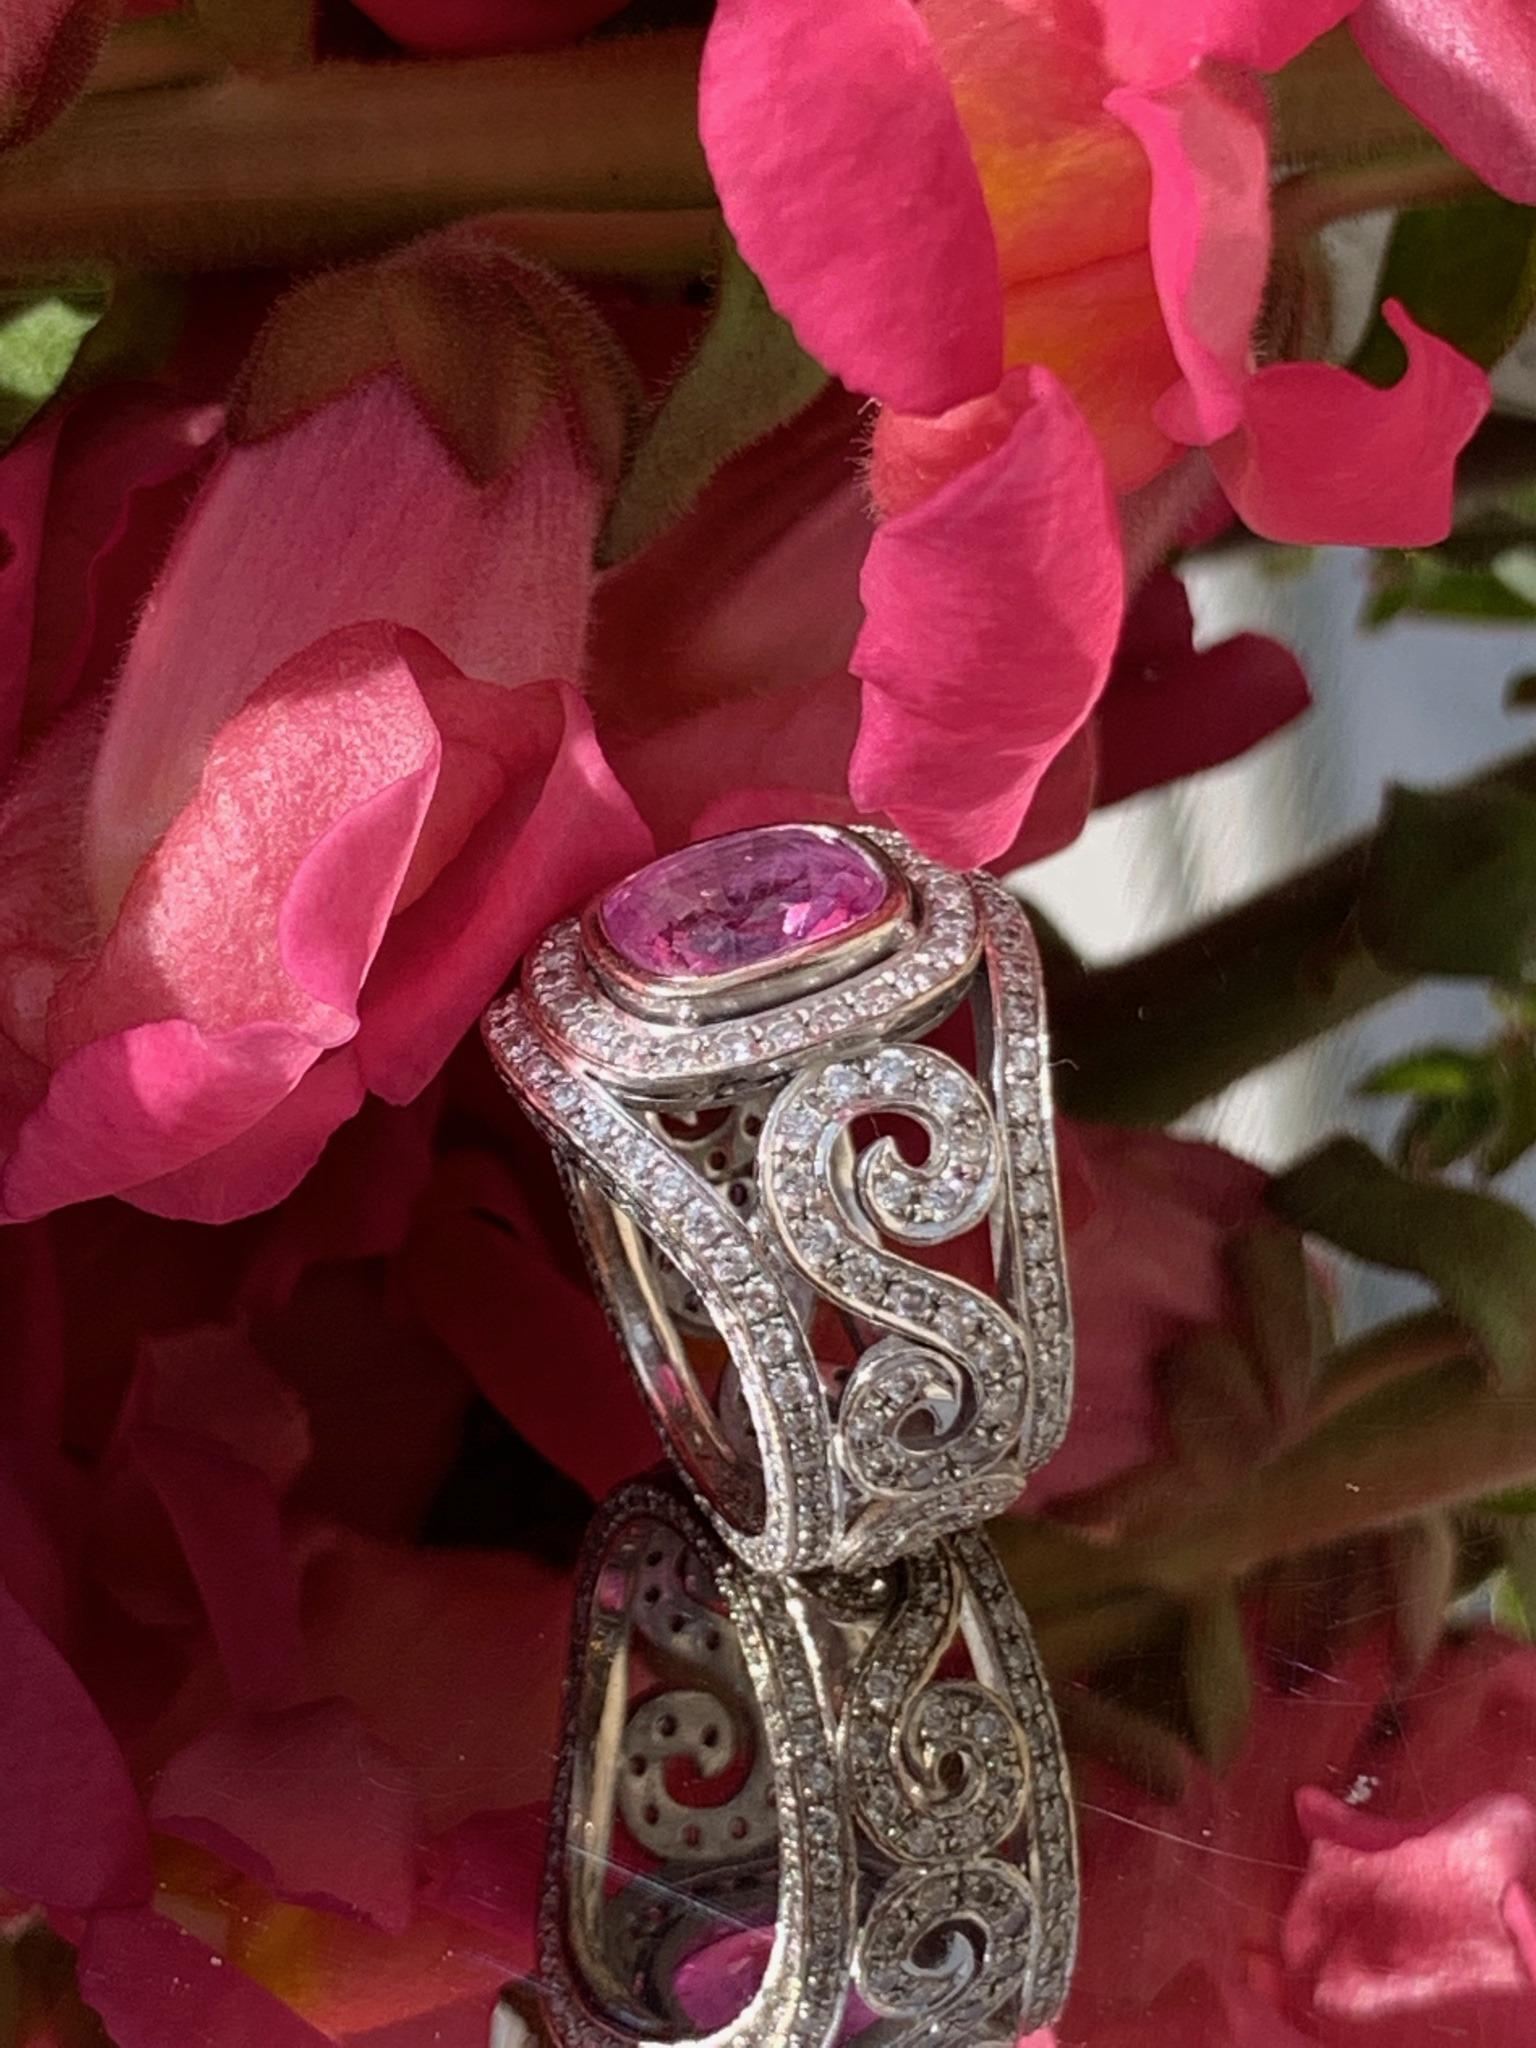 Cushion cut pink sapphire set with lots of diamonds